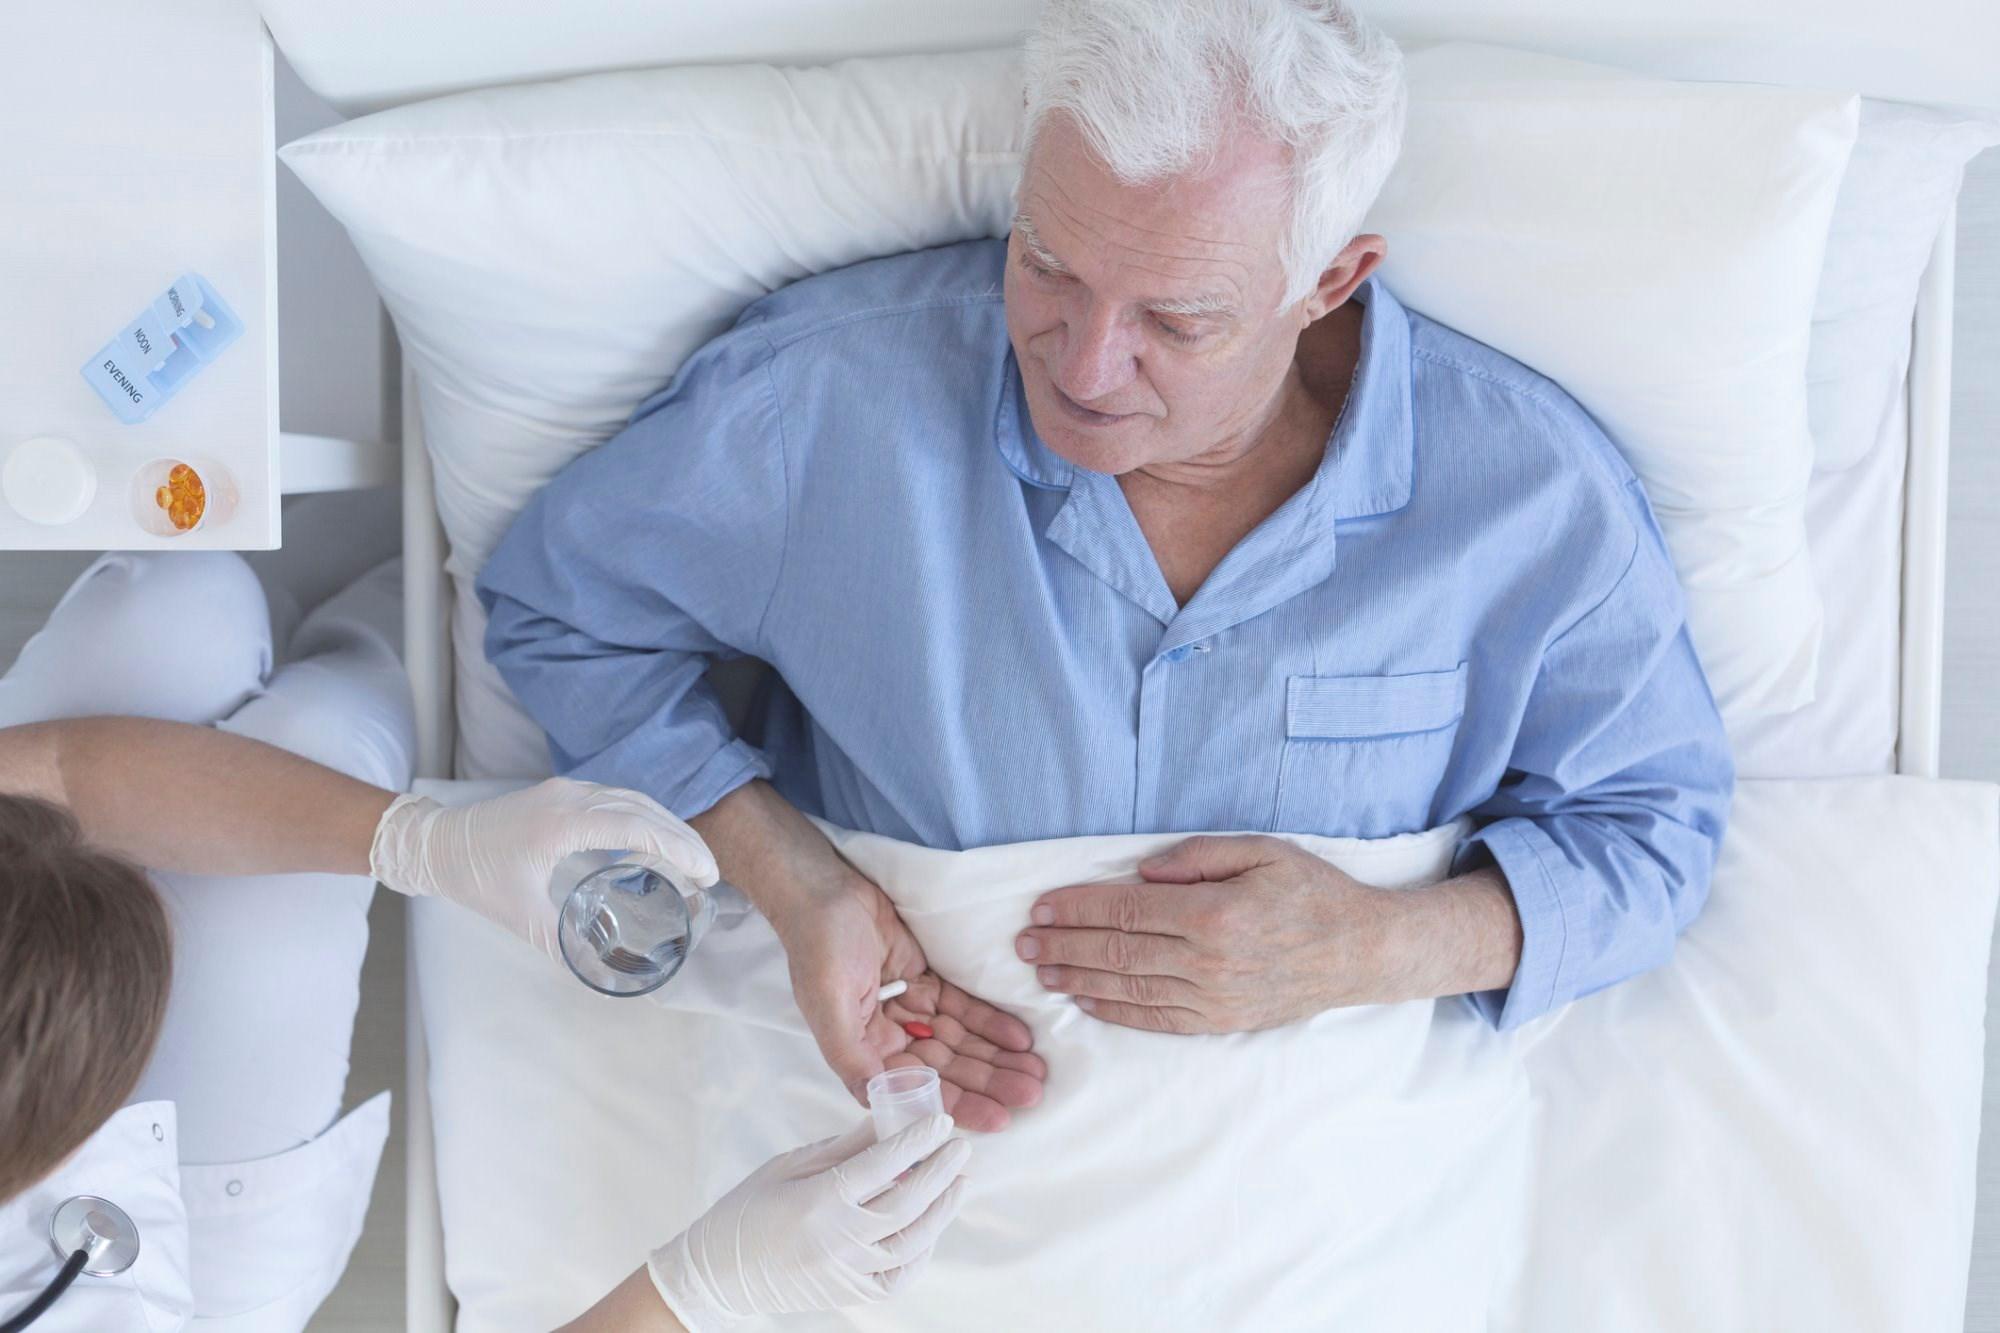 New Predictor of In-Hospital Acute Kidney Injury Identified